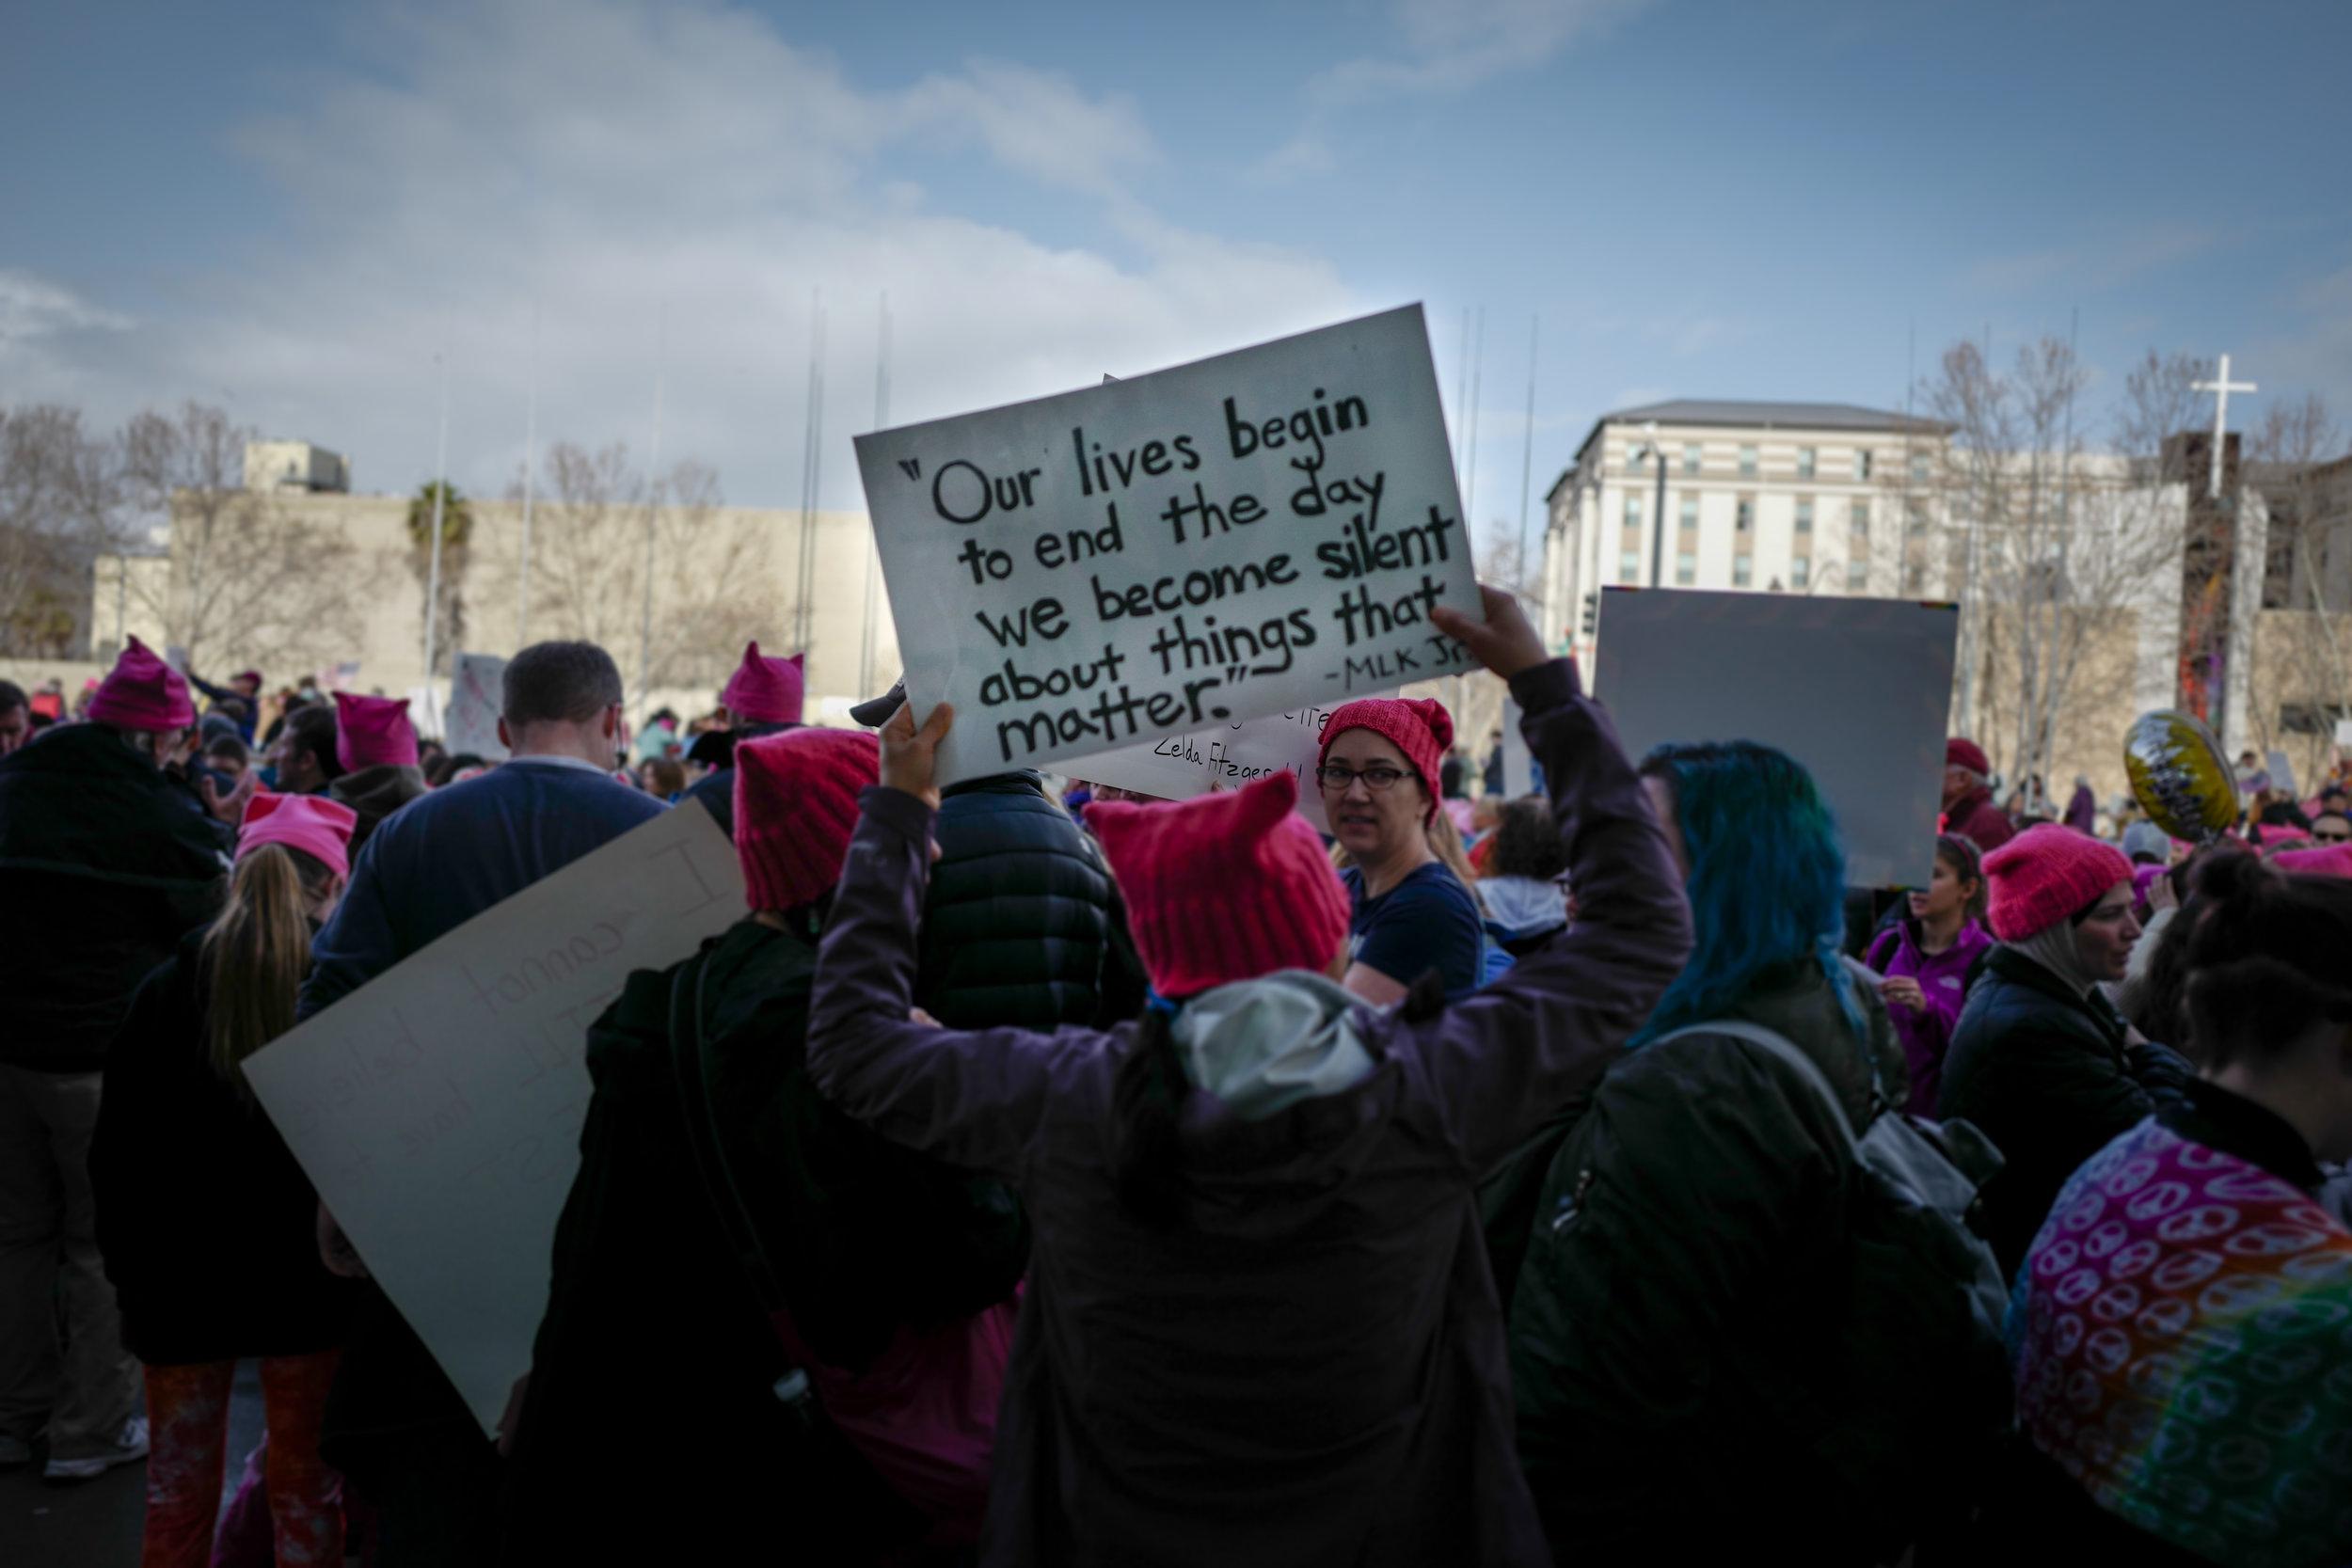 Women's March protestors in San Jose, California on Jan. 21, 2017.  Gordon-Shukwit / Flickr